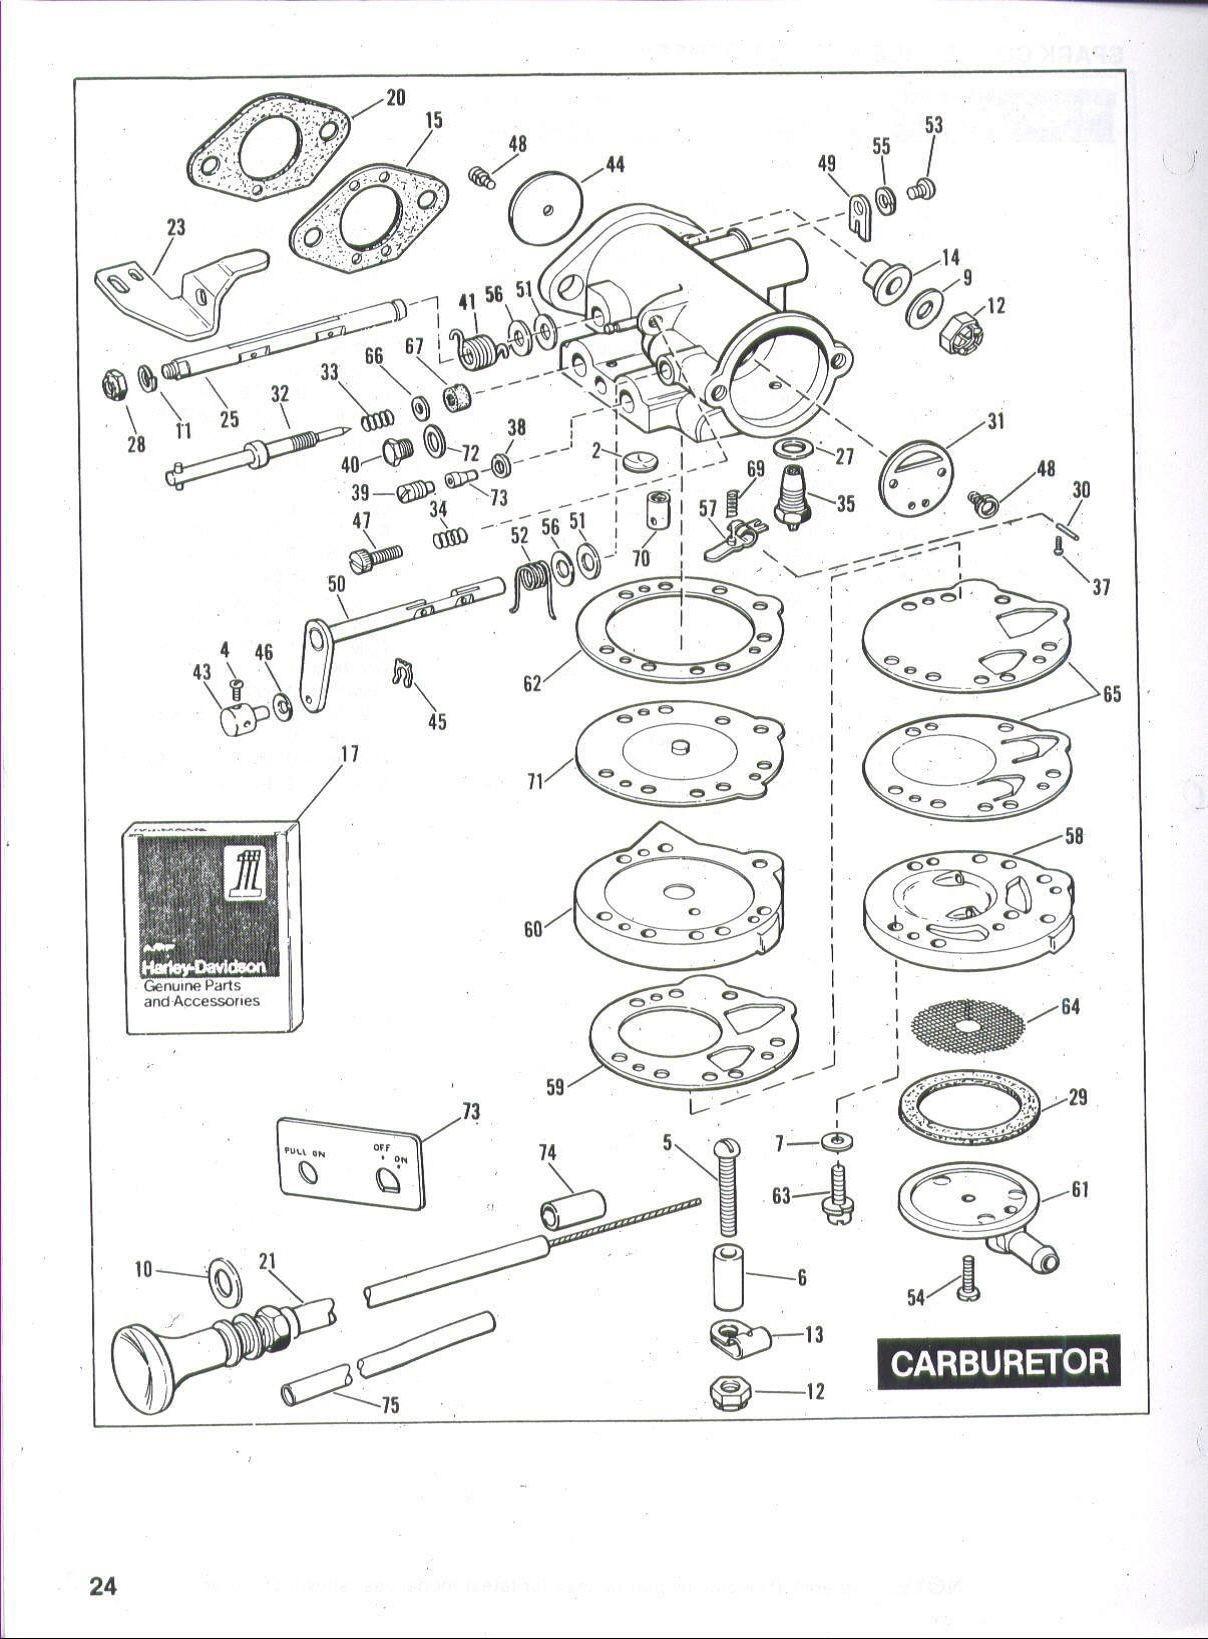 Small Engine Carburetor Diagram Harley Davidson Golf Cart